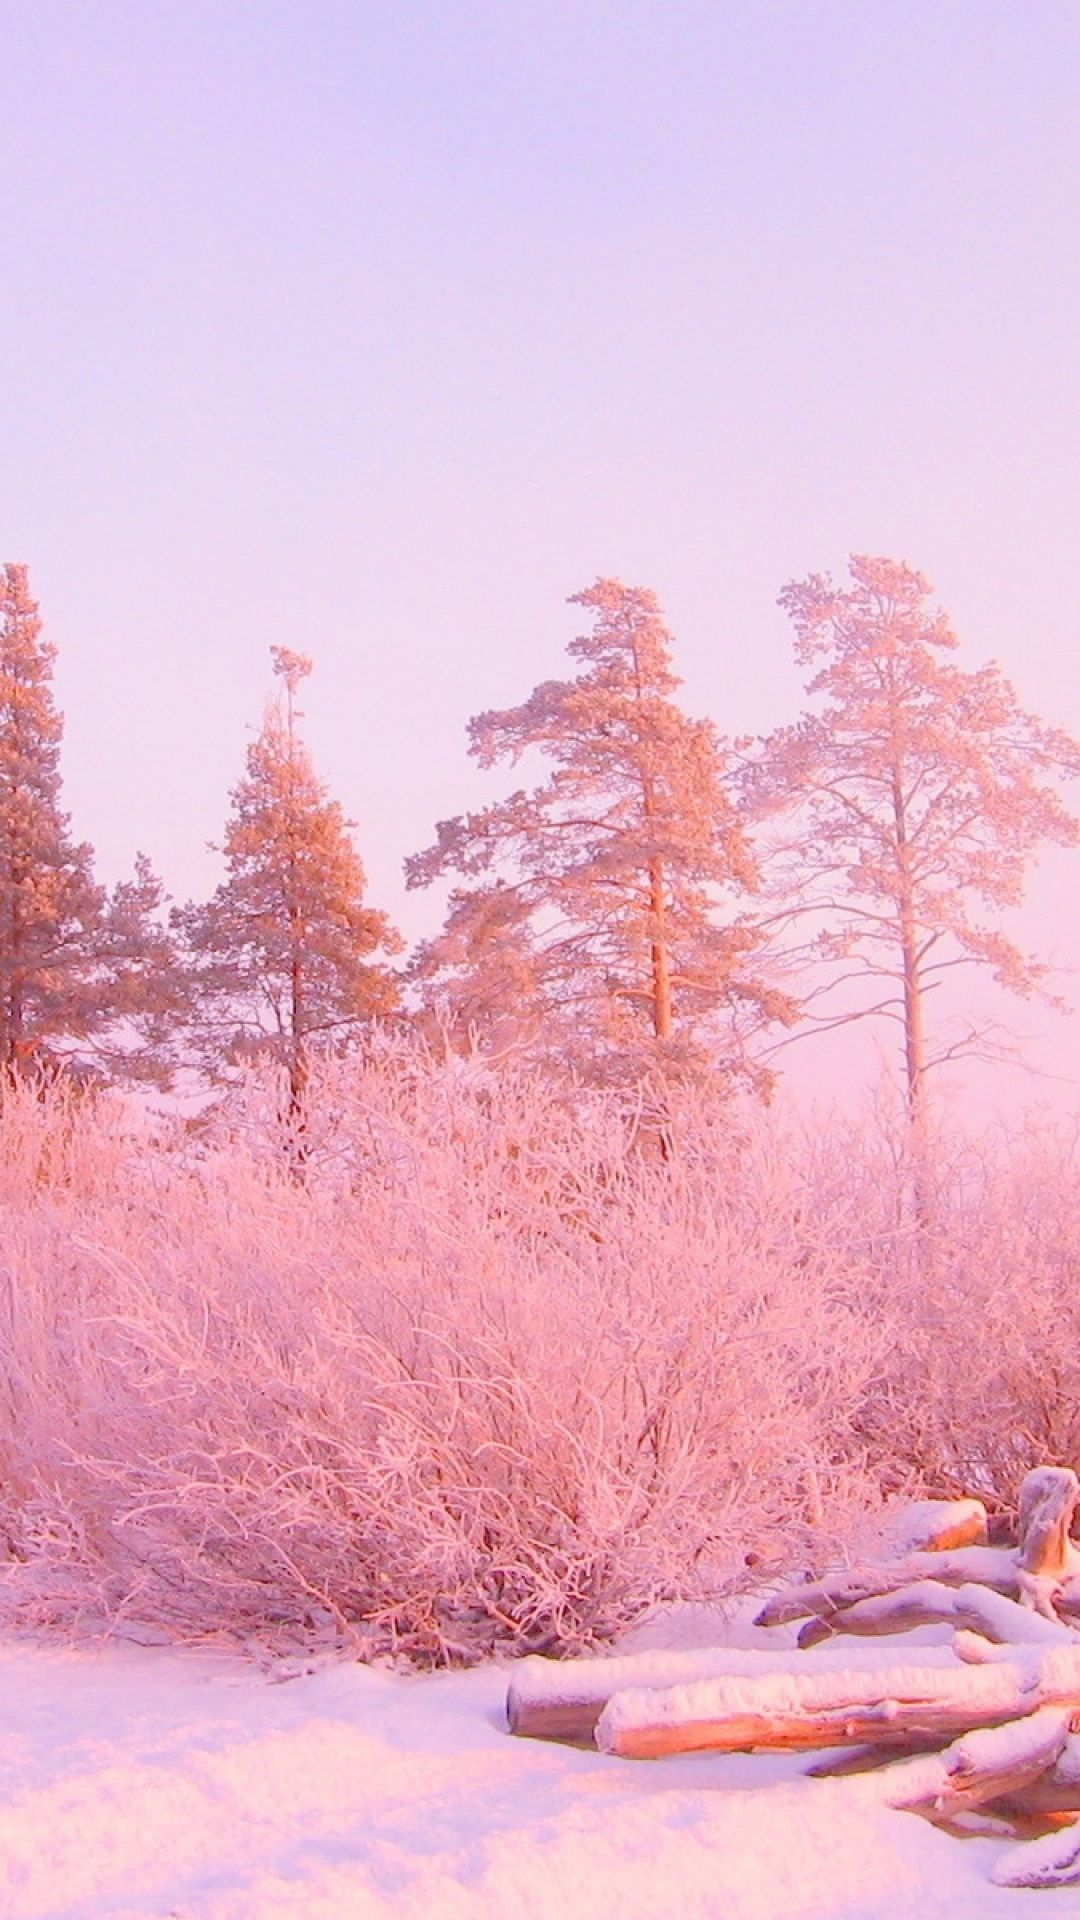 Download Wallpaper Mac Winter - 77b8e7a3476d17fa210756d242fa8e11  Pictures_26394.jpg